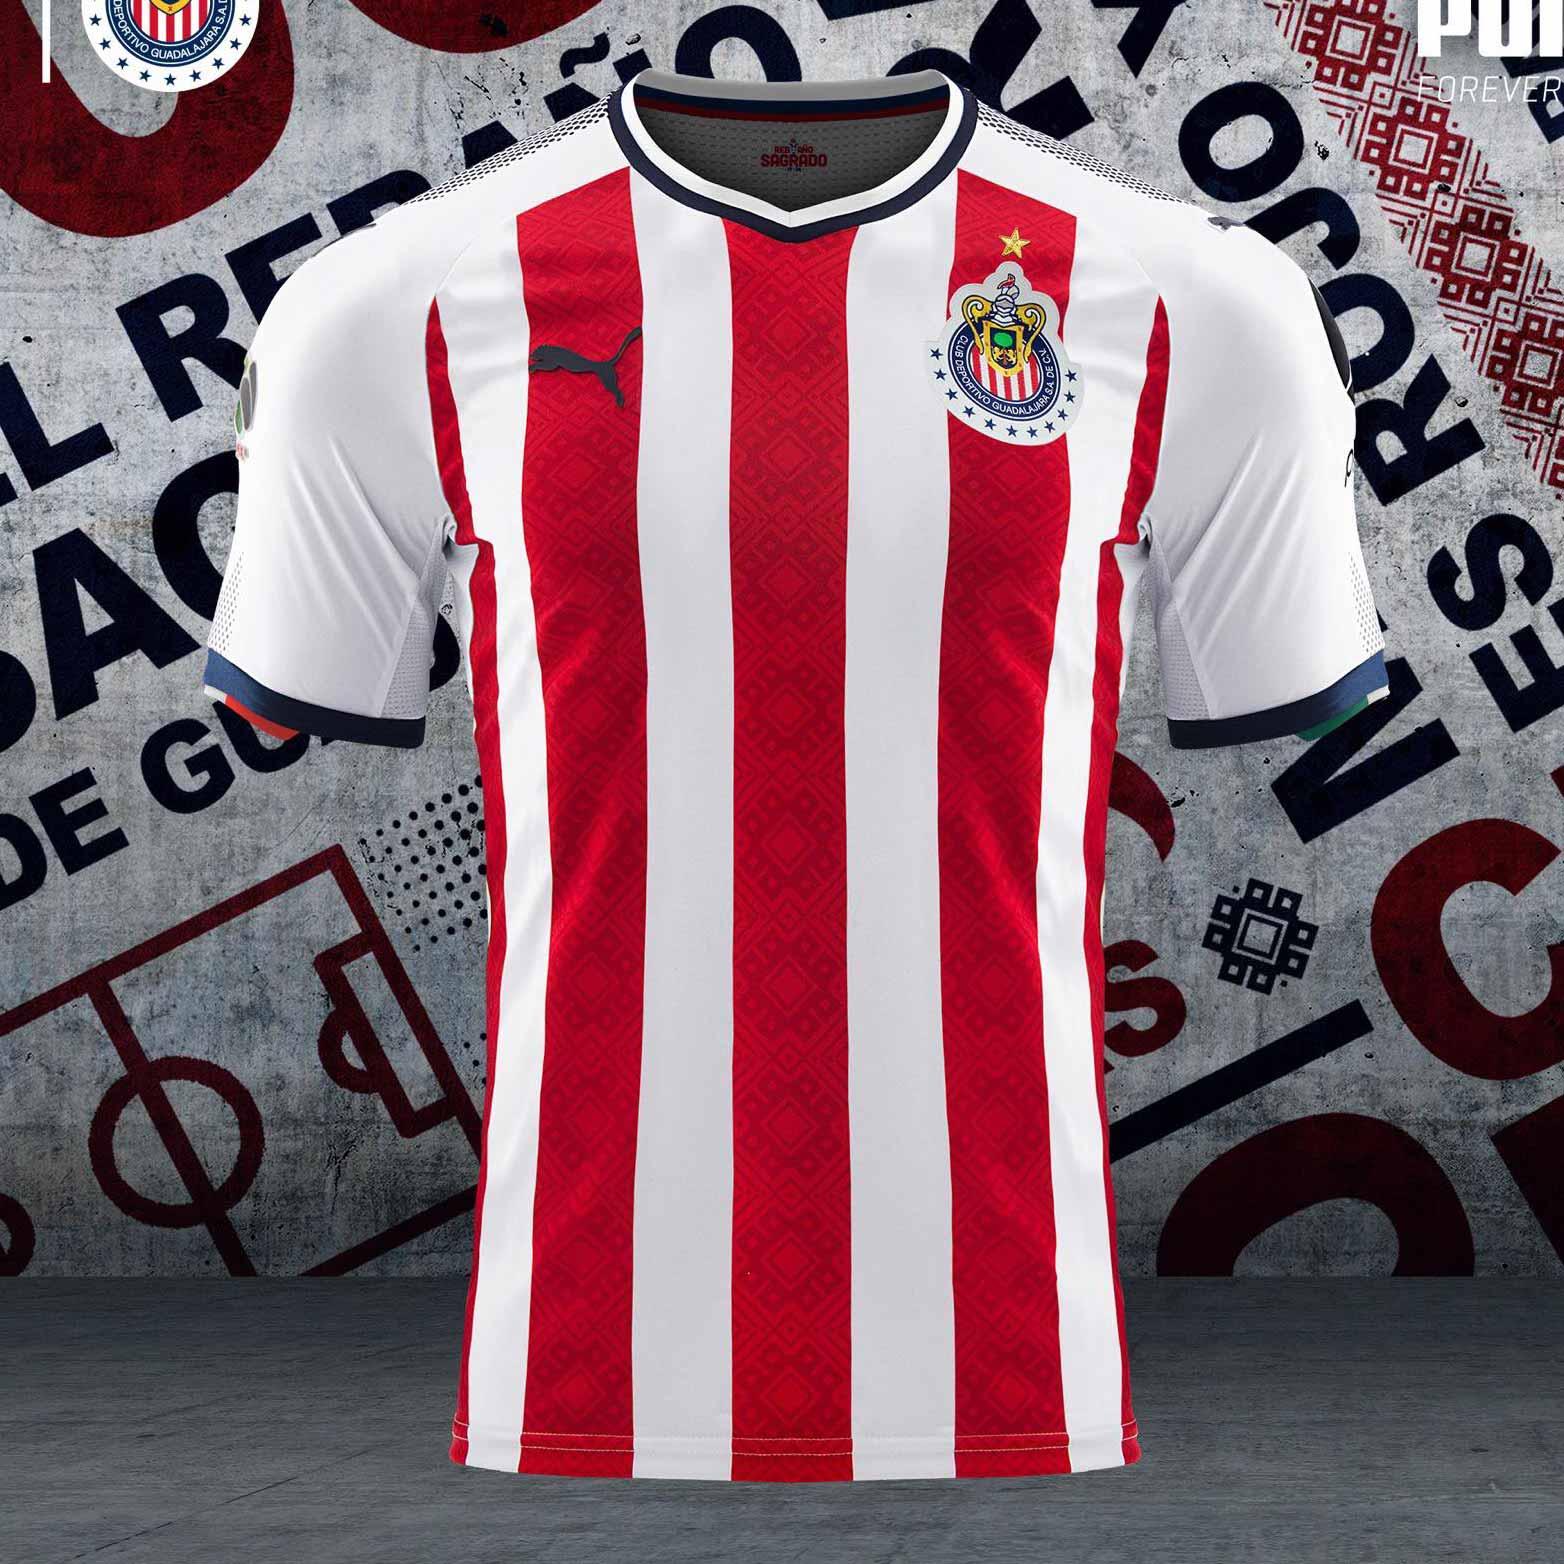 Chivas 17-18 Home Kit Revealed - Footy Headlines